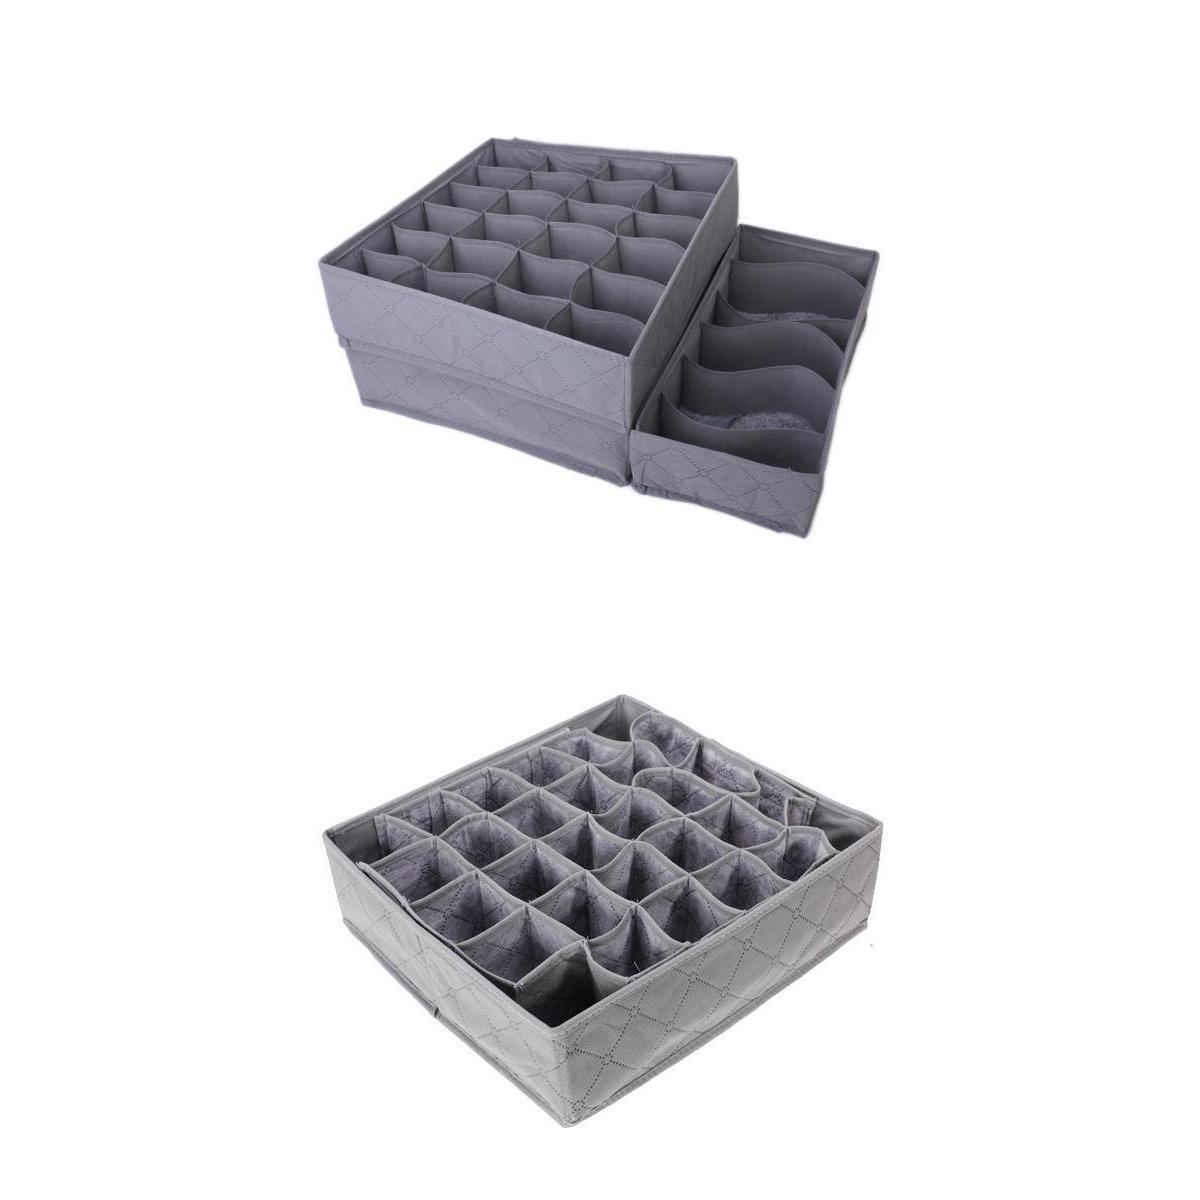 4Pcs Bamboo Charcoal Ties BRA Underwear Ties Socks Storage Organizer Divider Box